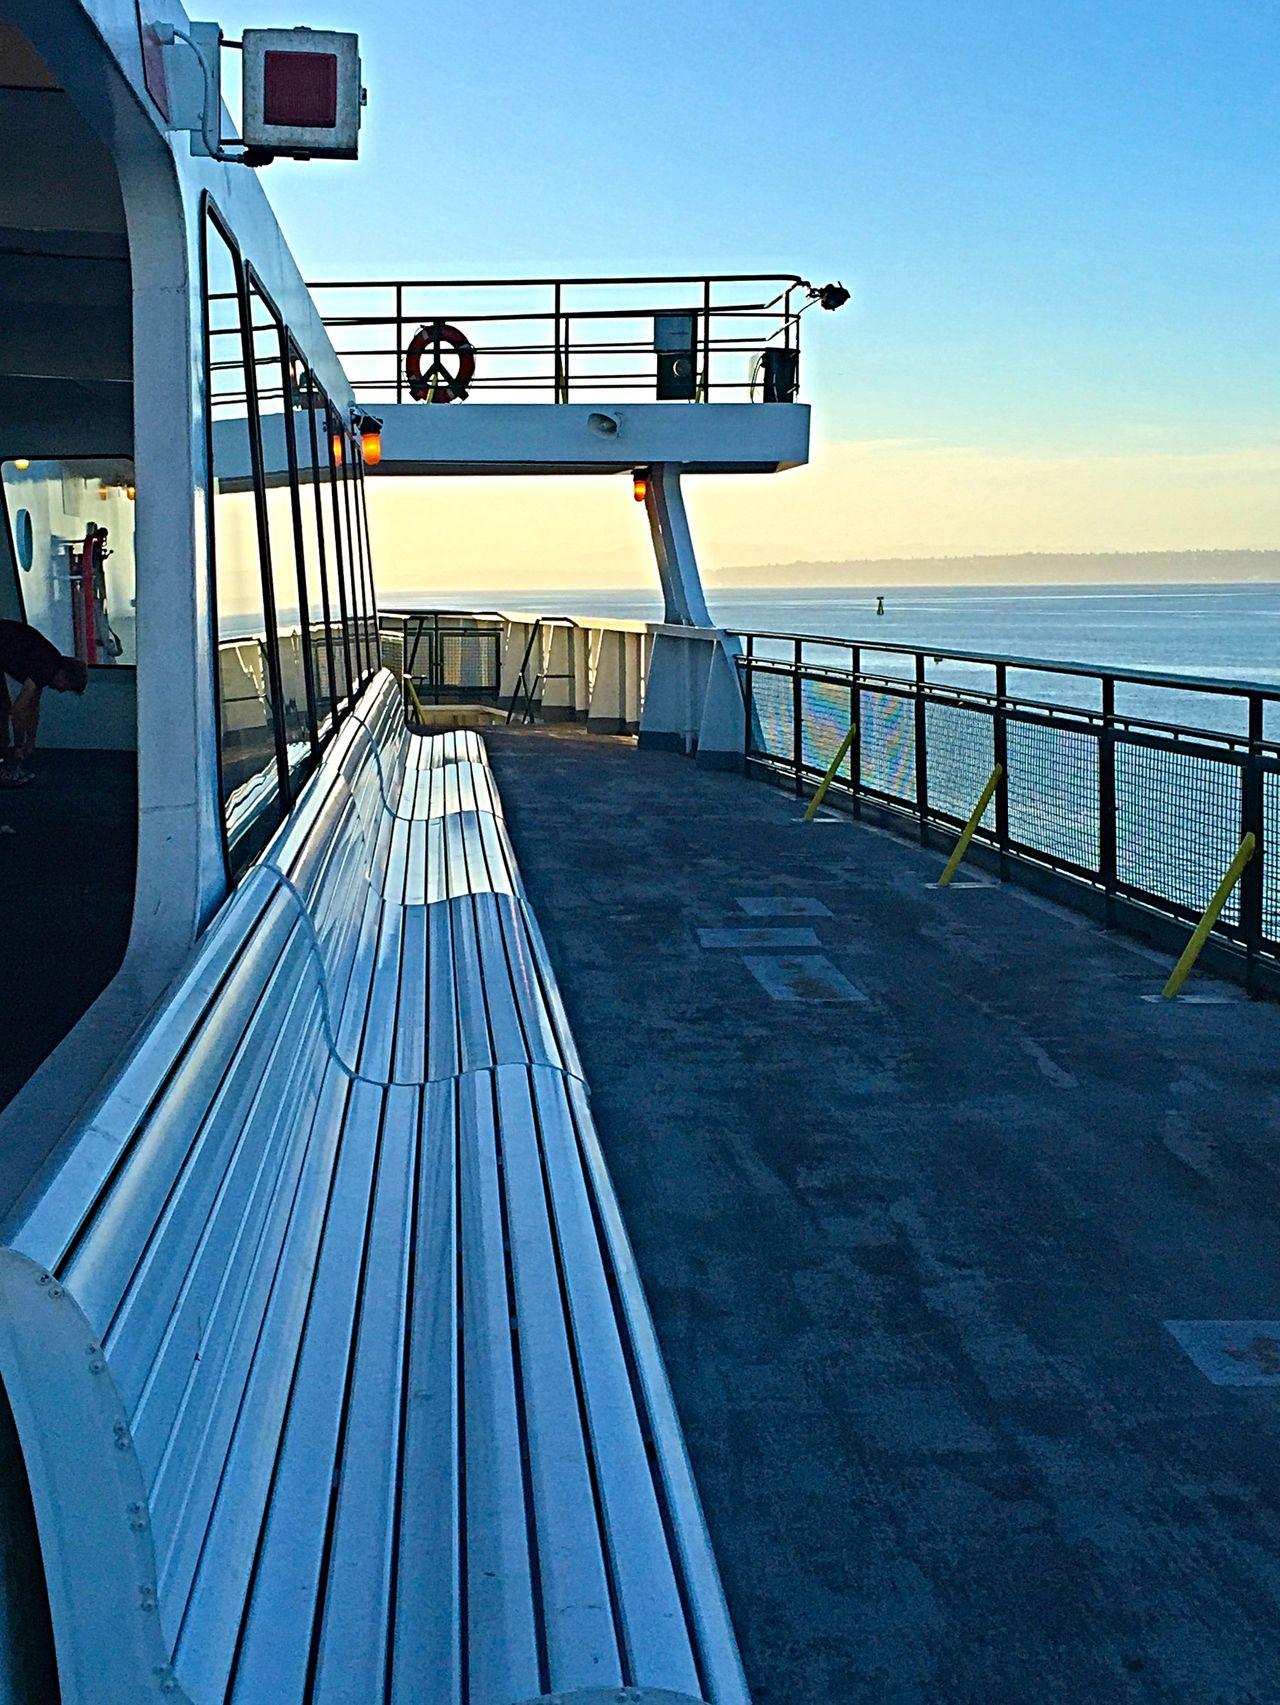 Bainbridge Island Ferry Ferry Ferry Passengers Horizon Over Water Scenics Sea Seattle Seattle Skyline Seattle, Washington Sunlight Sunrise Walkway Washington Ferry Water My Commute On The Way